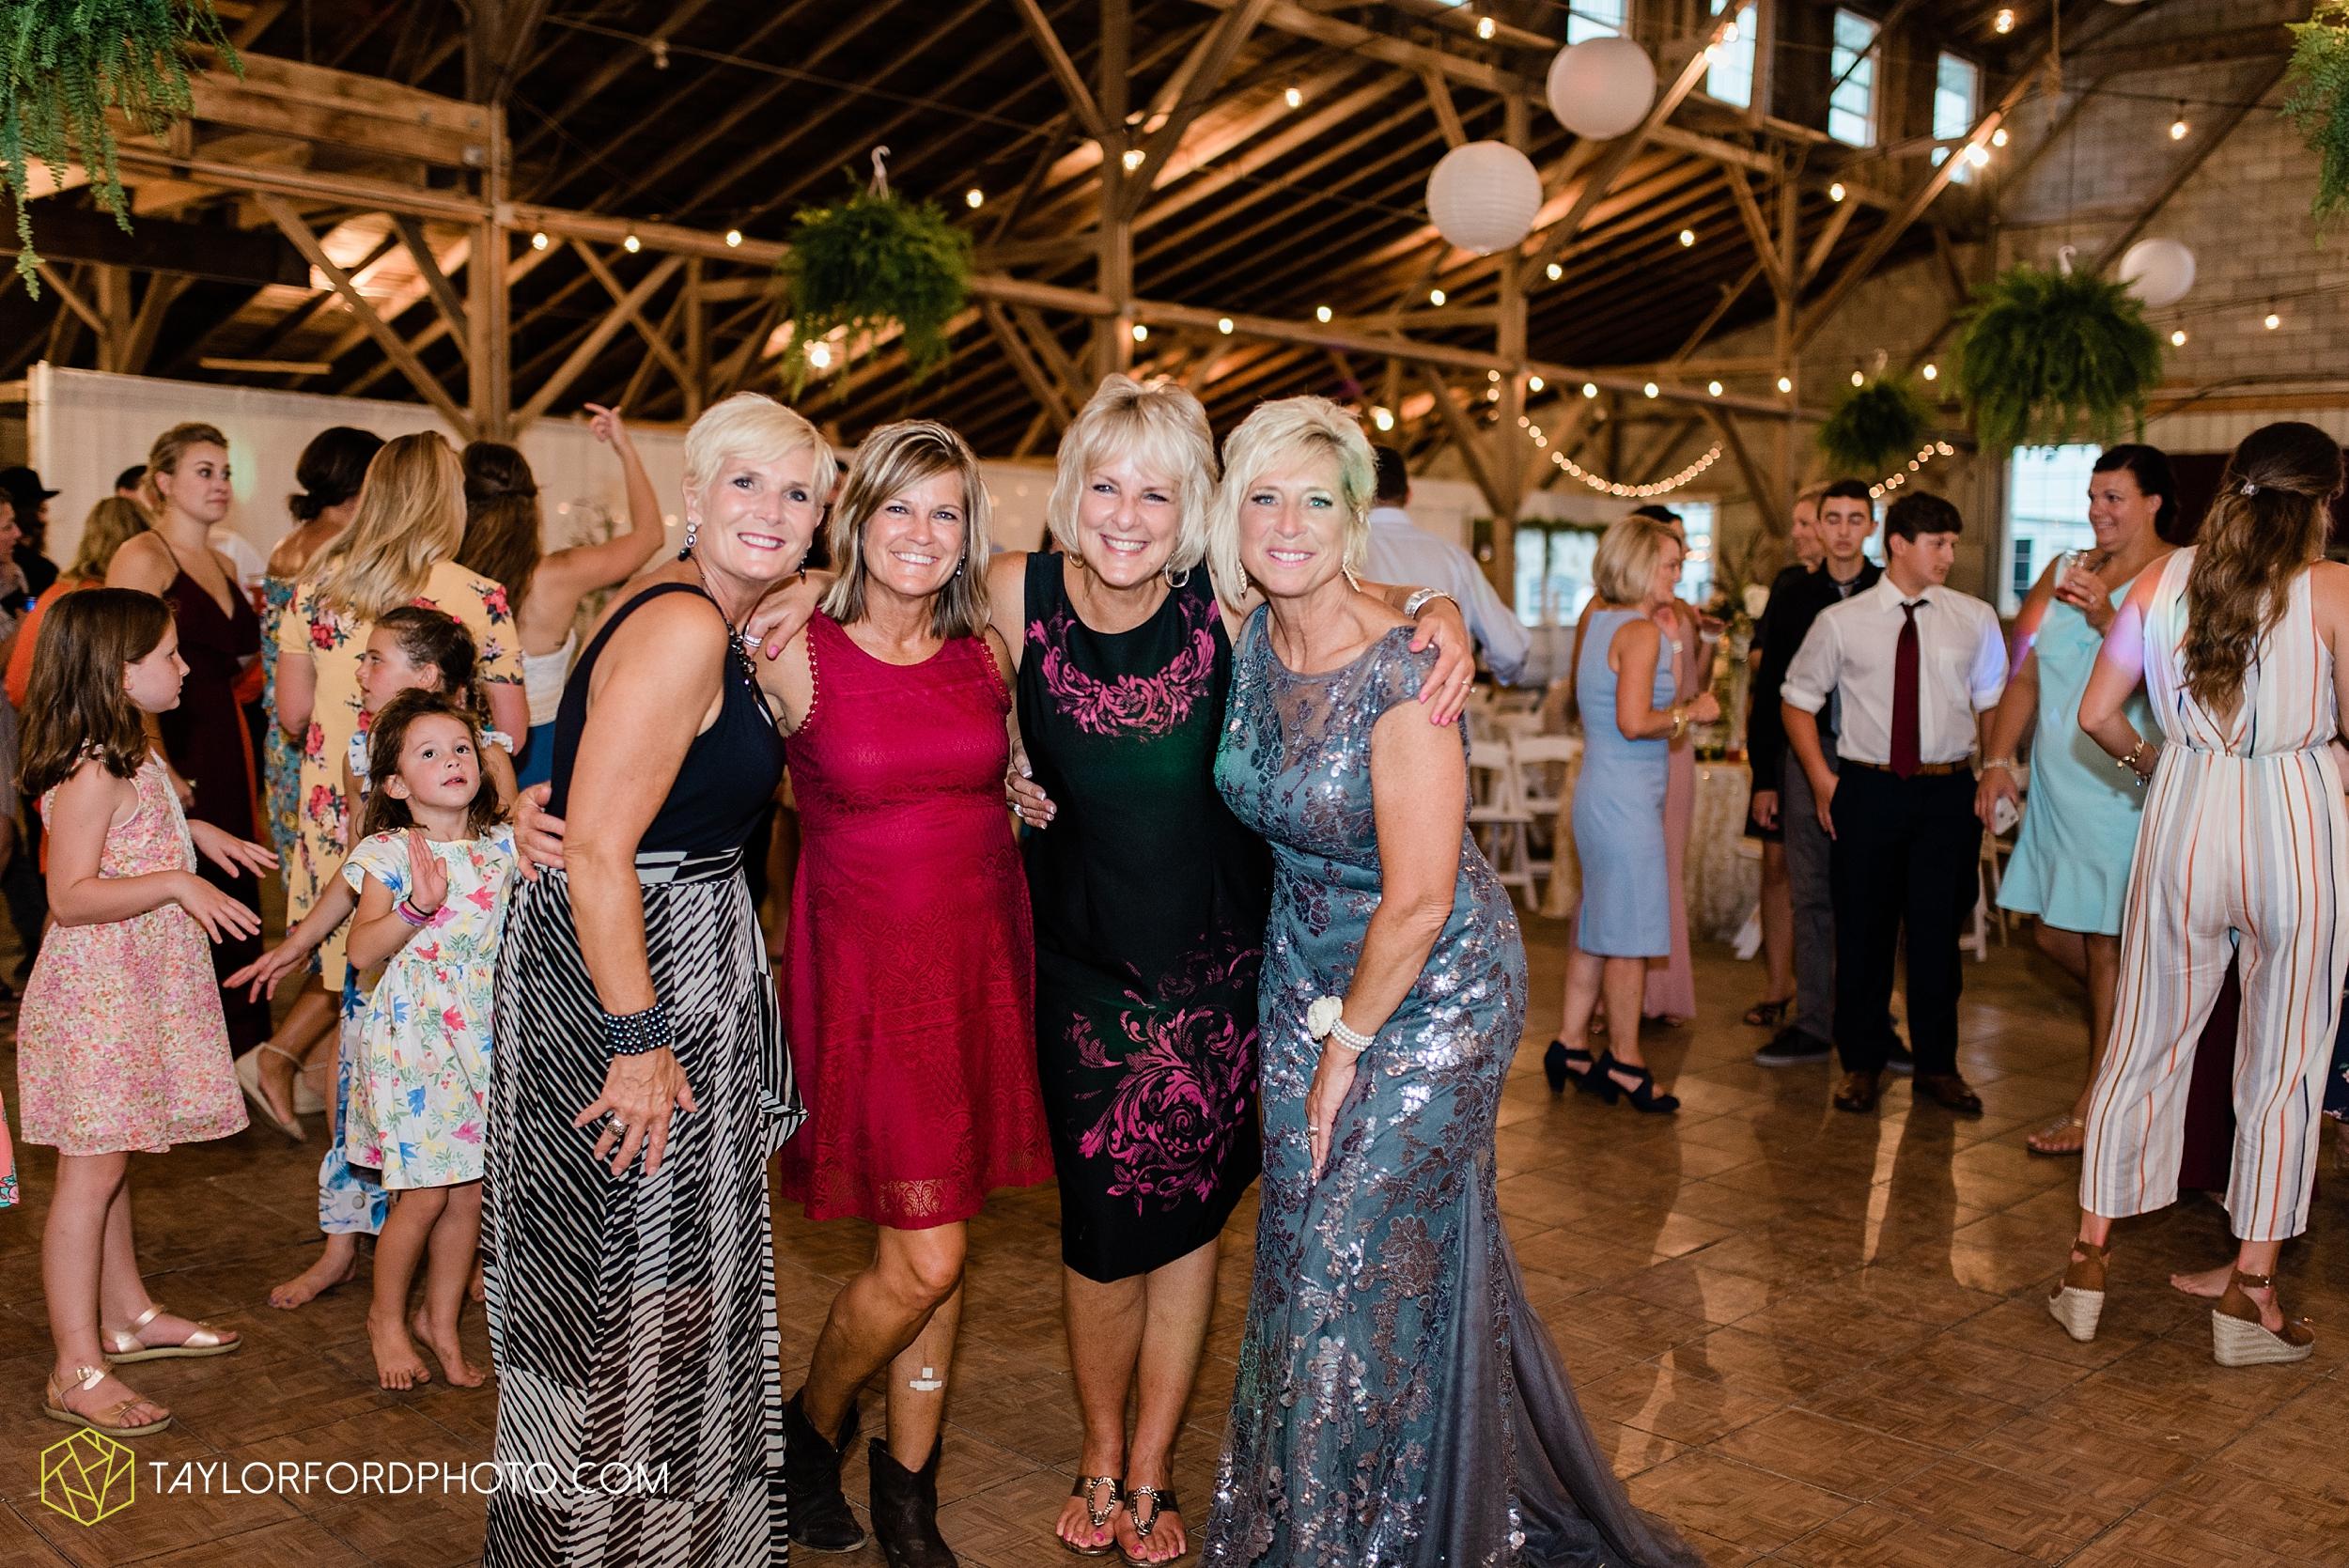 van-wert-ohio-first-united-methodist-church-county-dairy-barn-wedding-photographer-taylor-ford-photography_9880.jpg